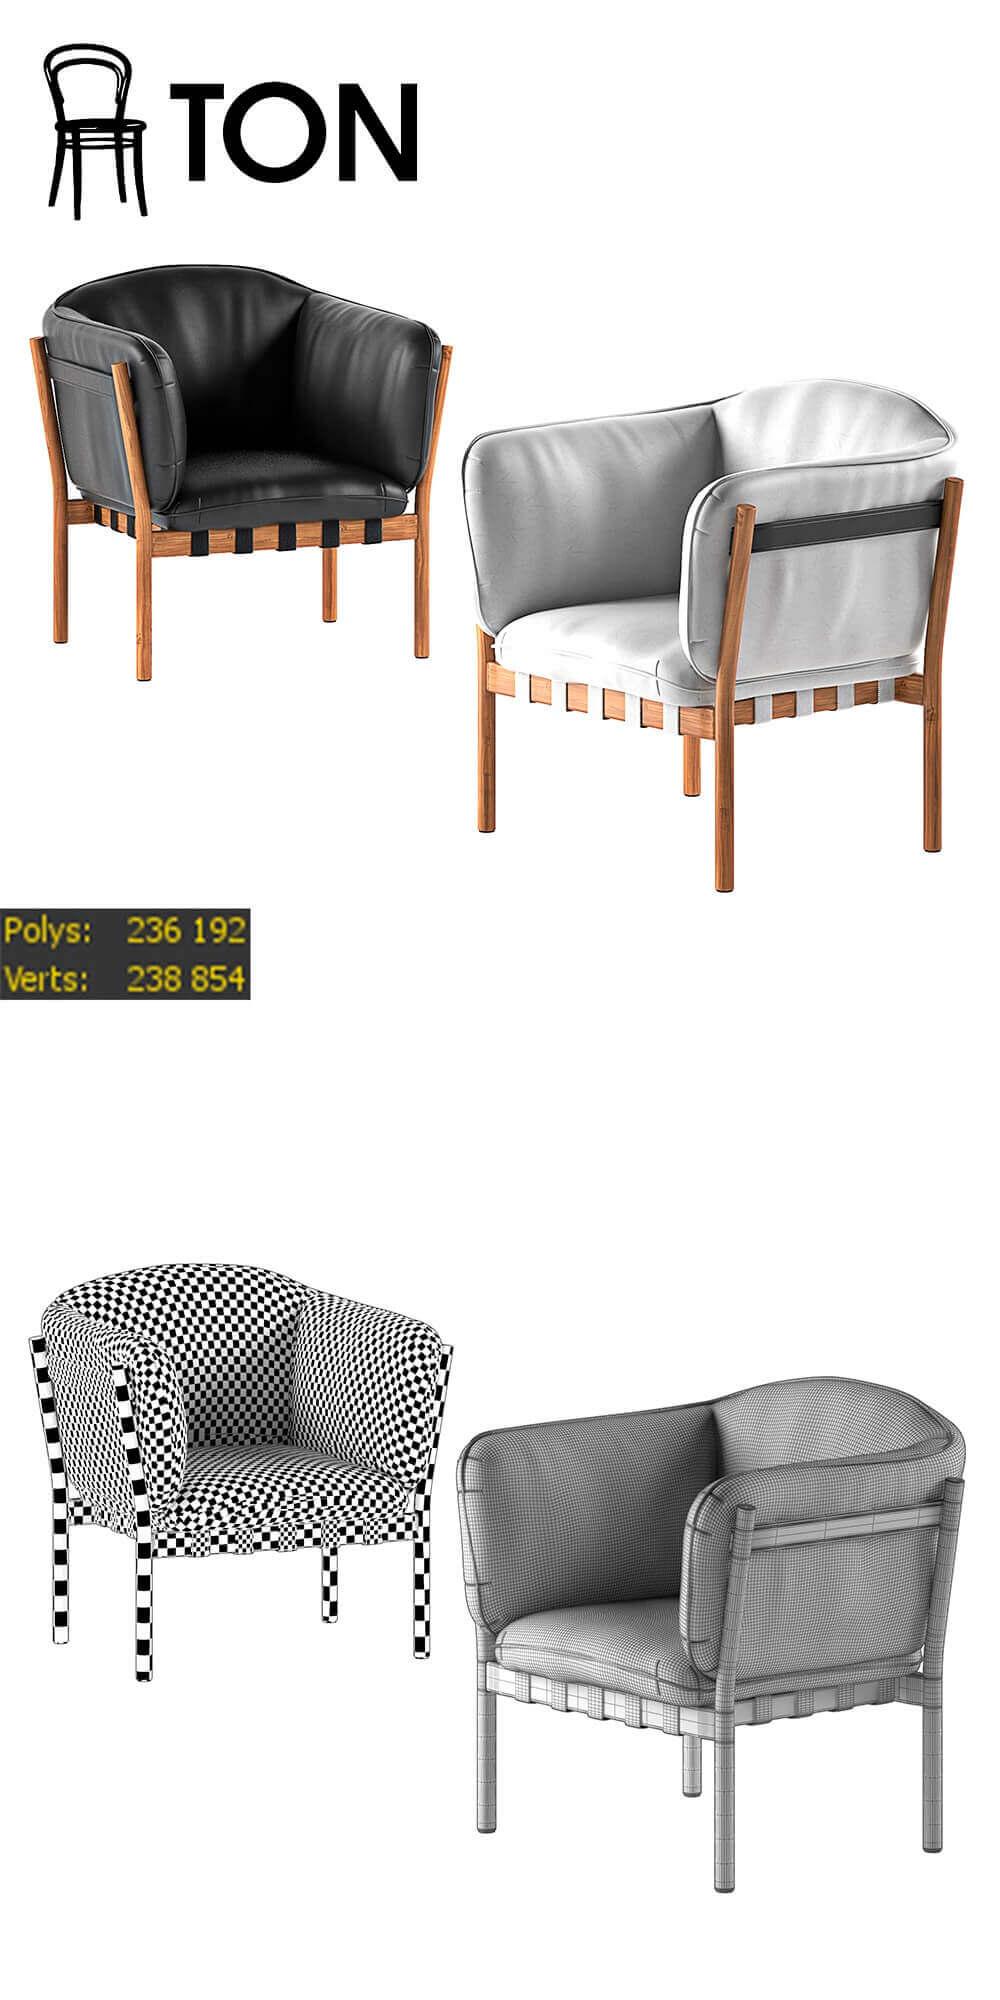 Dowel by Ton chair 3D model 2